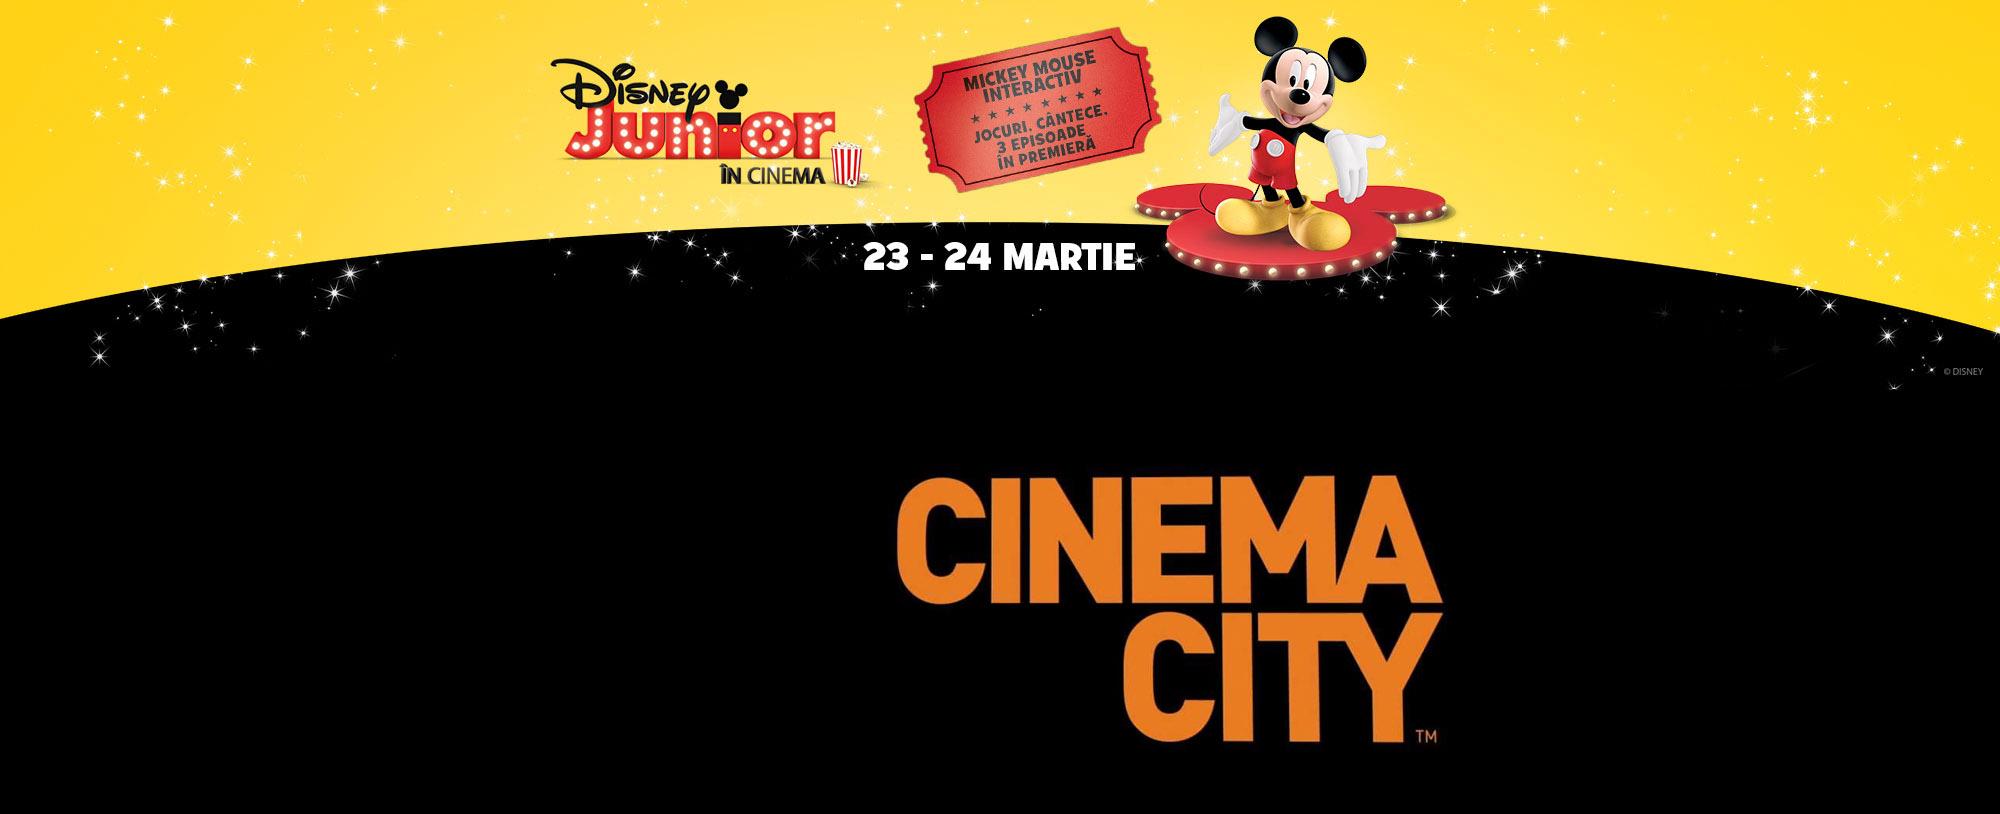 Eroii Disney Junior vin pe marele ecran